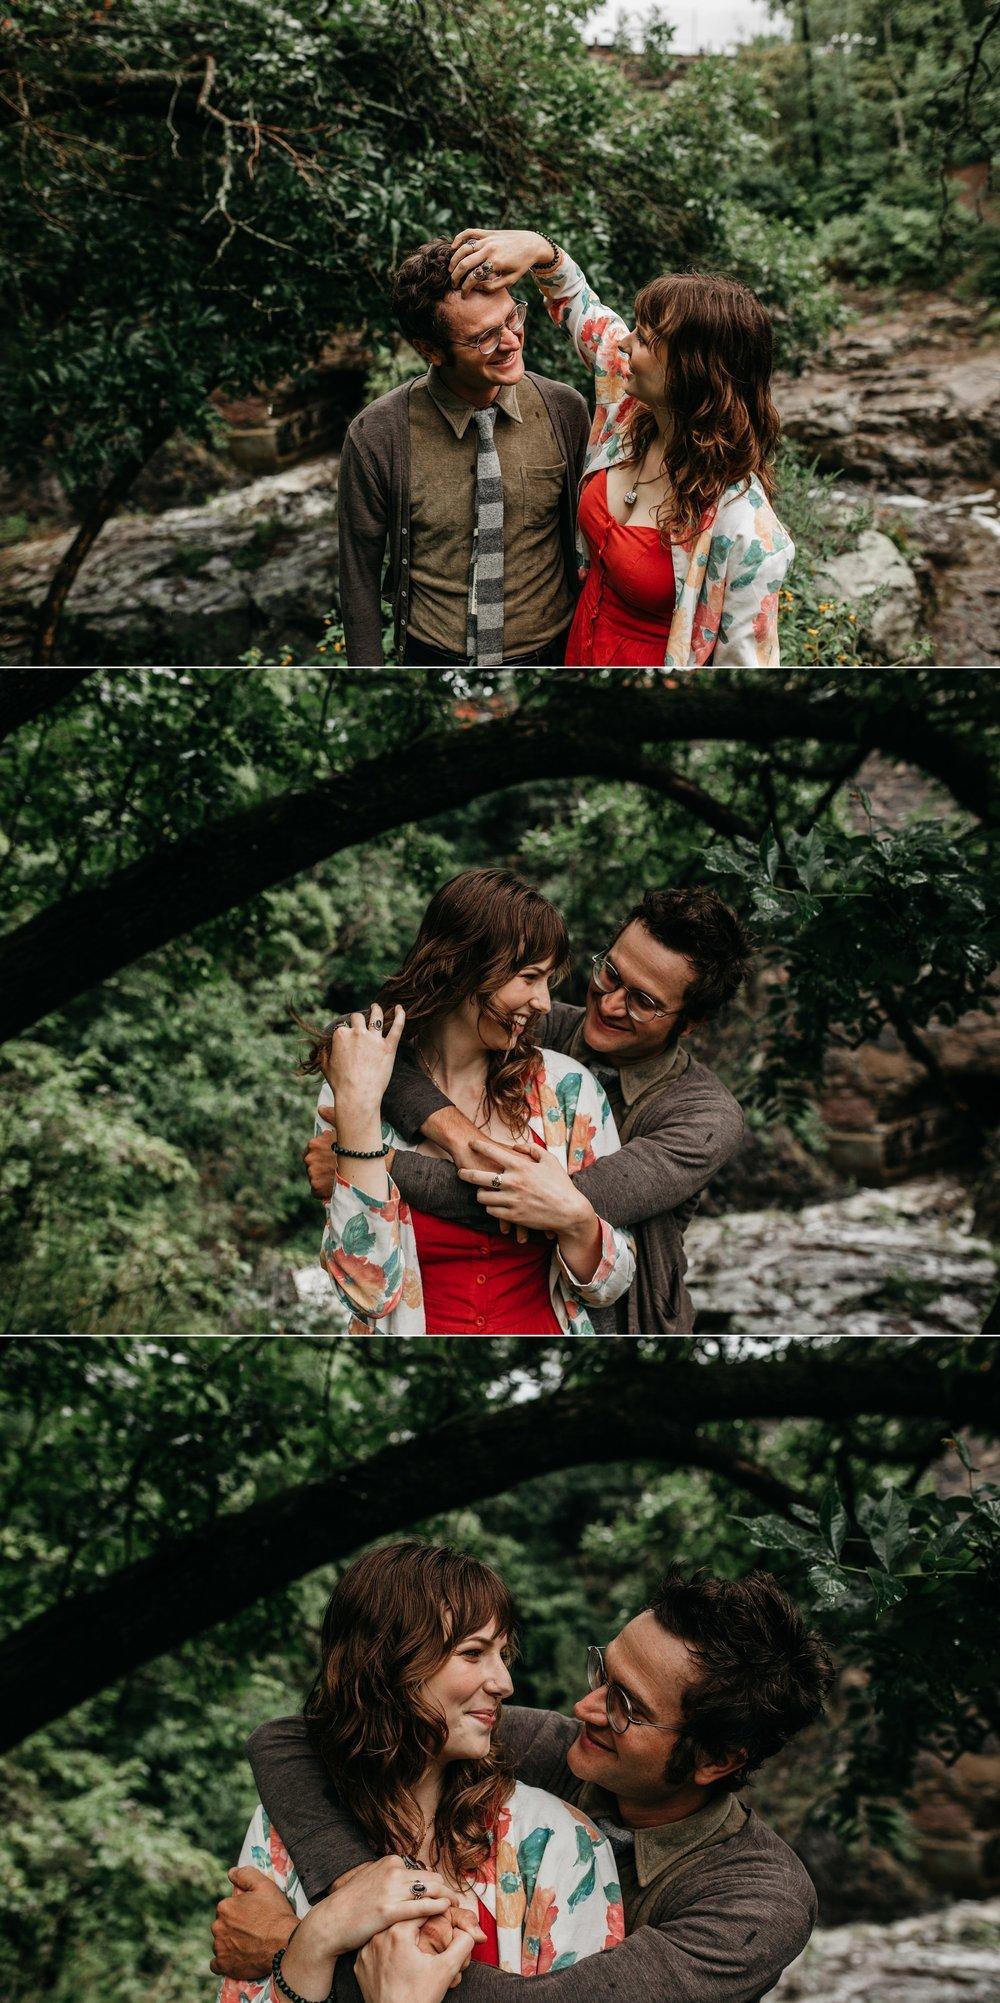 mandy aaron engagement minneapolis minnesota texas austin wedding elopement destination intimate best photographer_0100.jpg